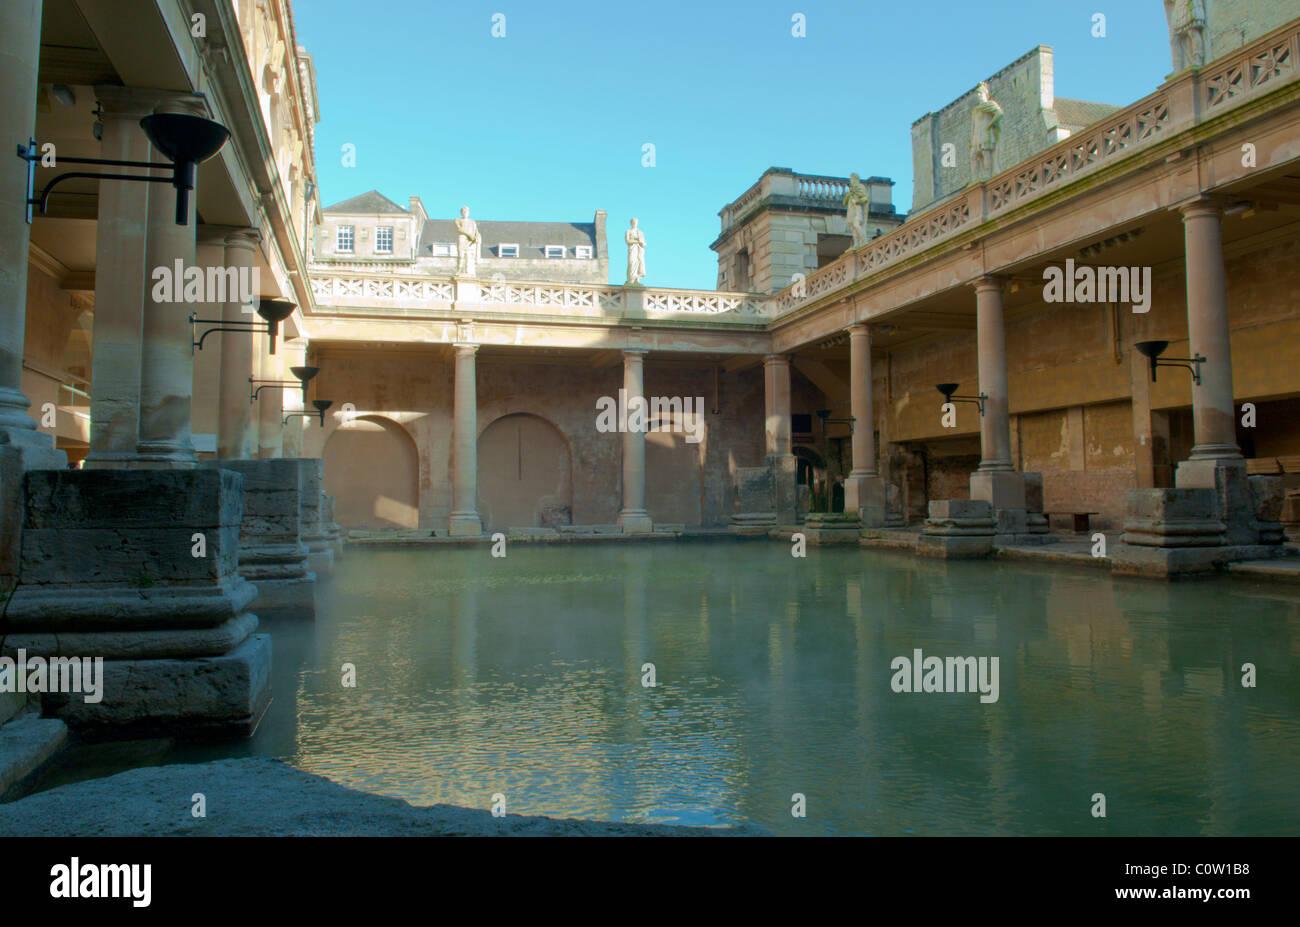 Great Bath. The Roman Baths, Bath, Somerset, UK. - Stock Image